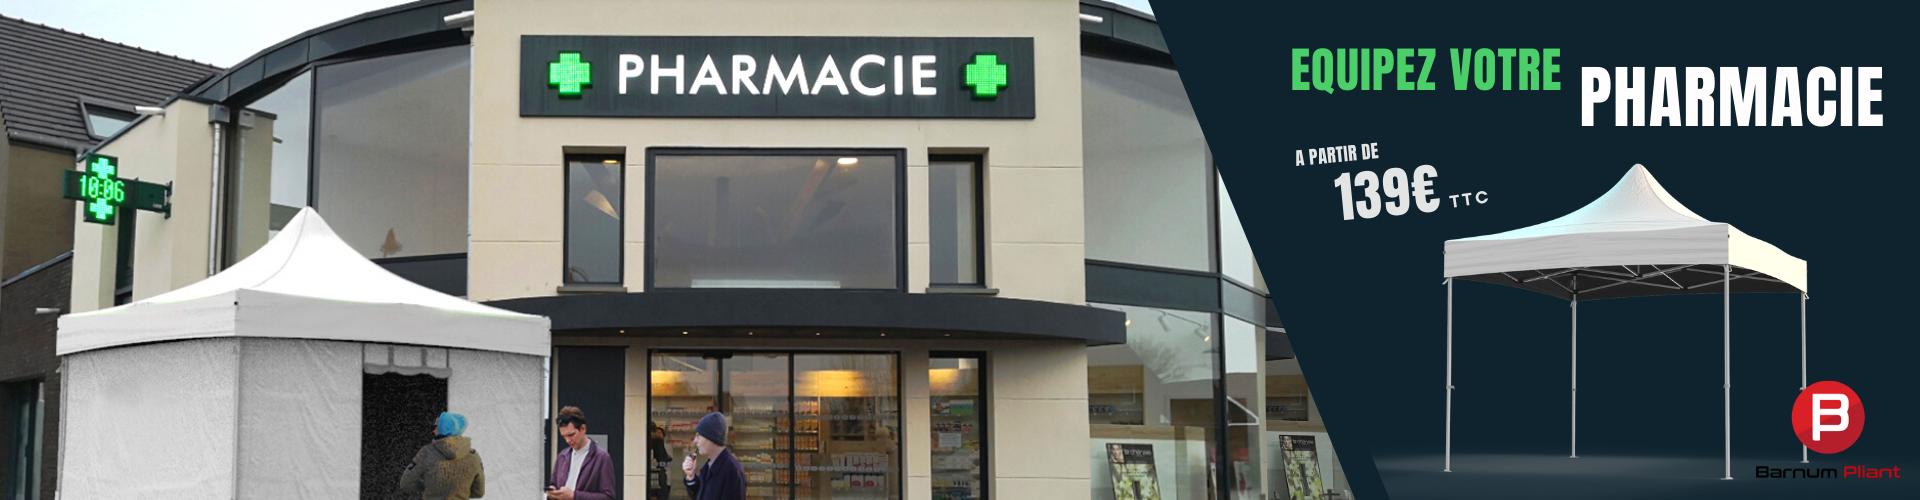 Slider barnum pliant pour pharmacie